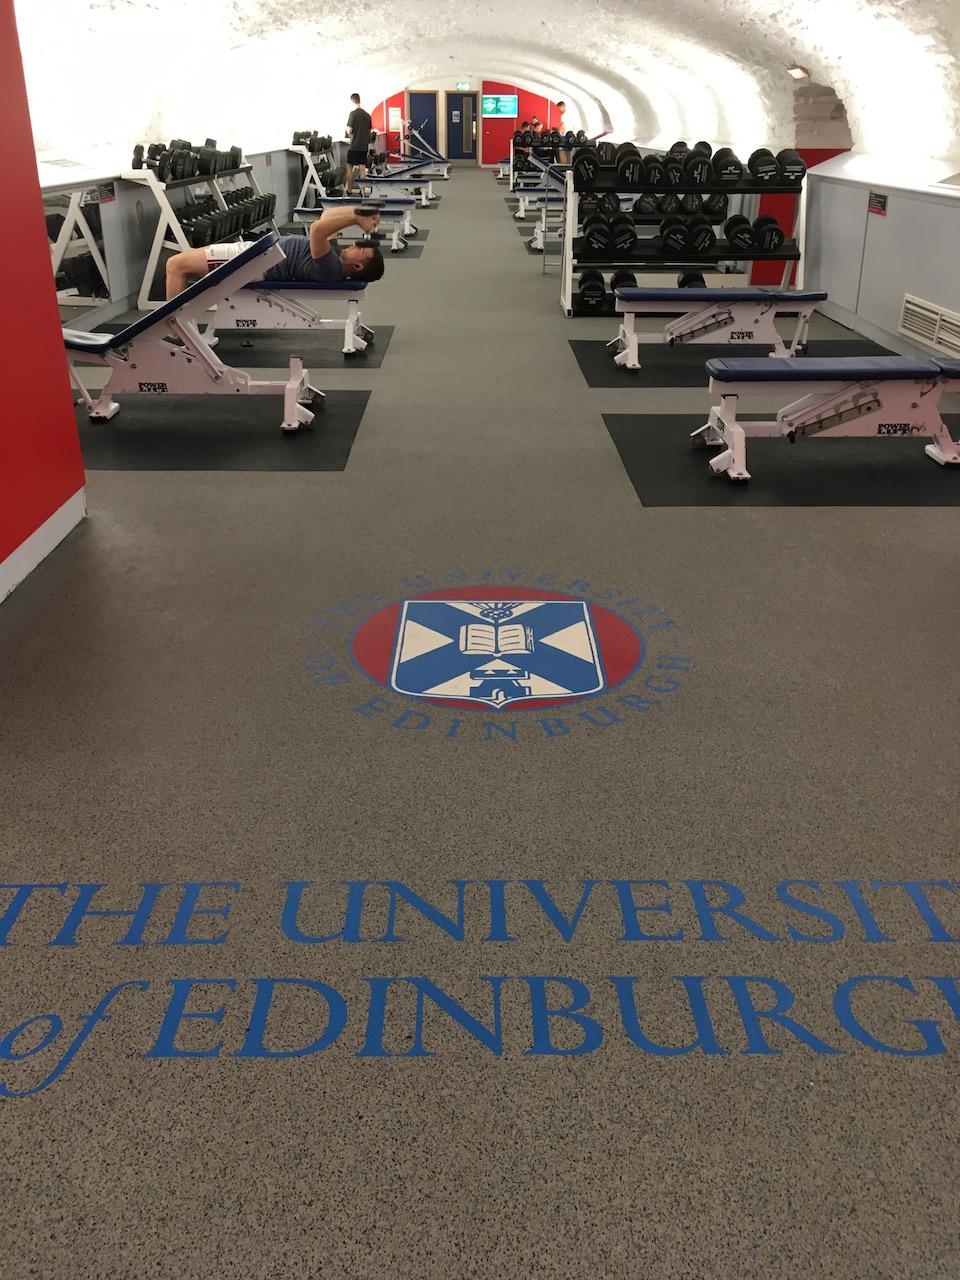 Pleasance Gym是我专注于练麒麟臂的地方。off-peak(工作日下午2点以后不能用)的会员一年只要£60,就可以享受世界级的facilities